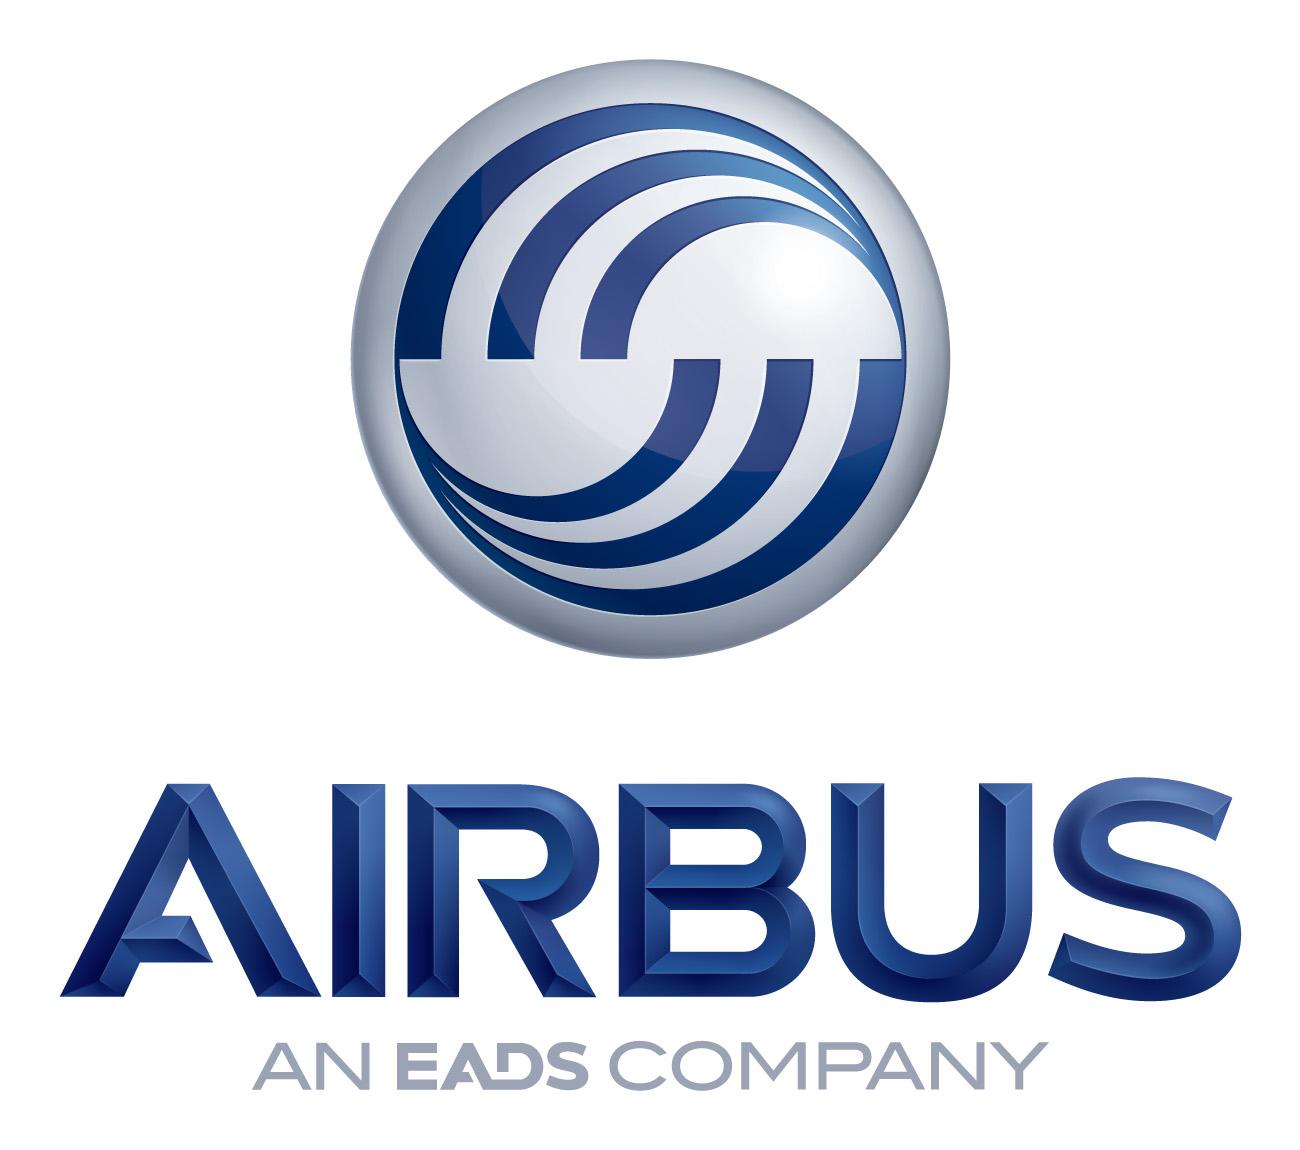 airbus sas address